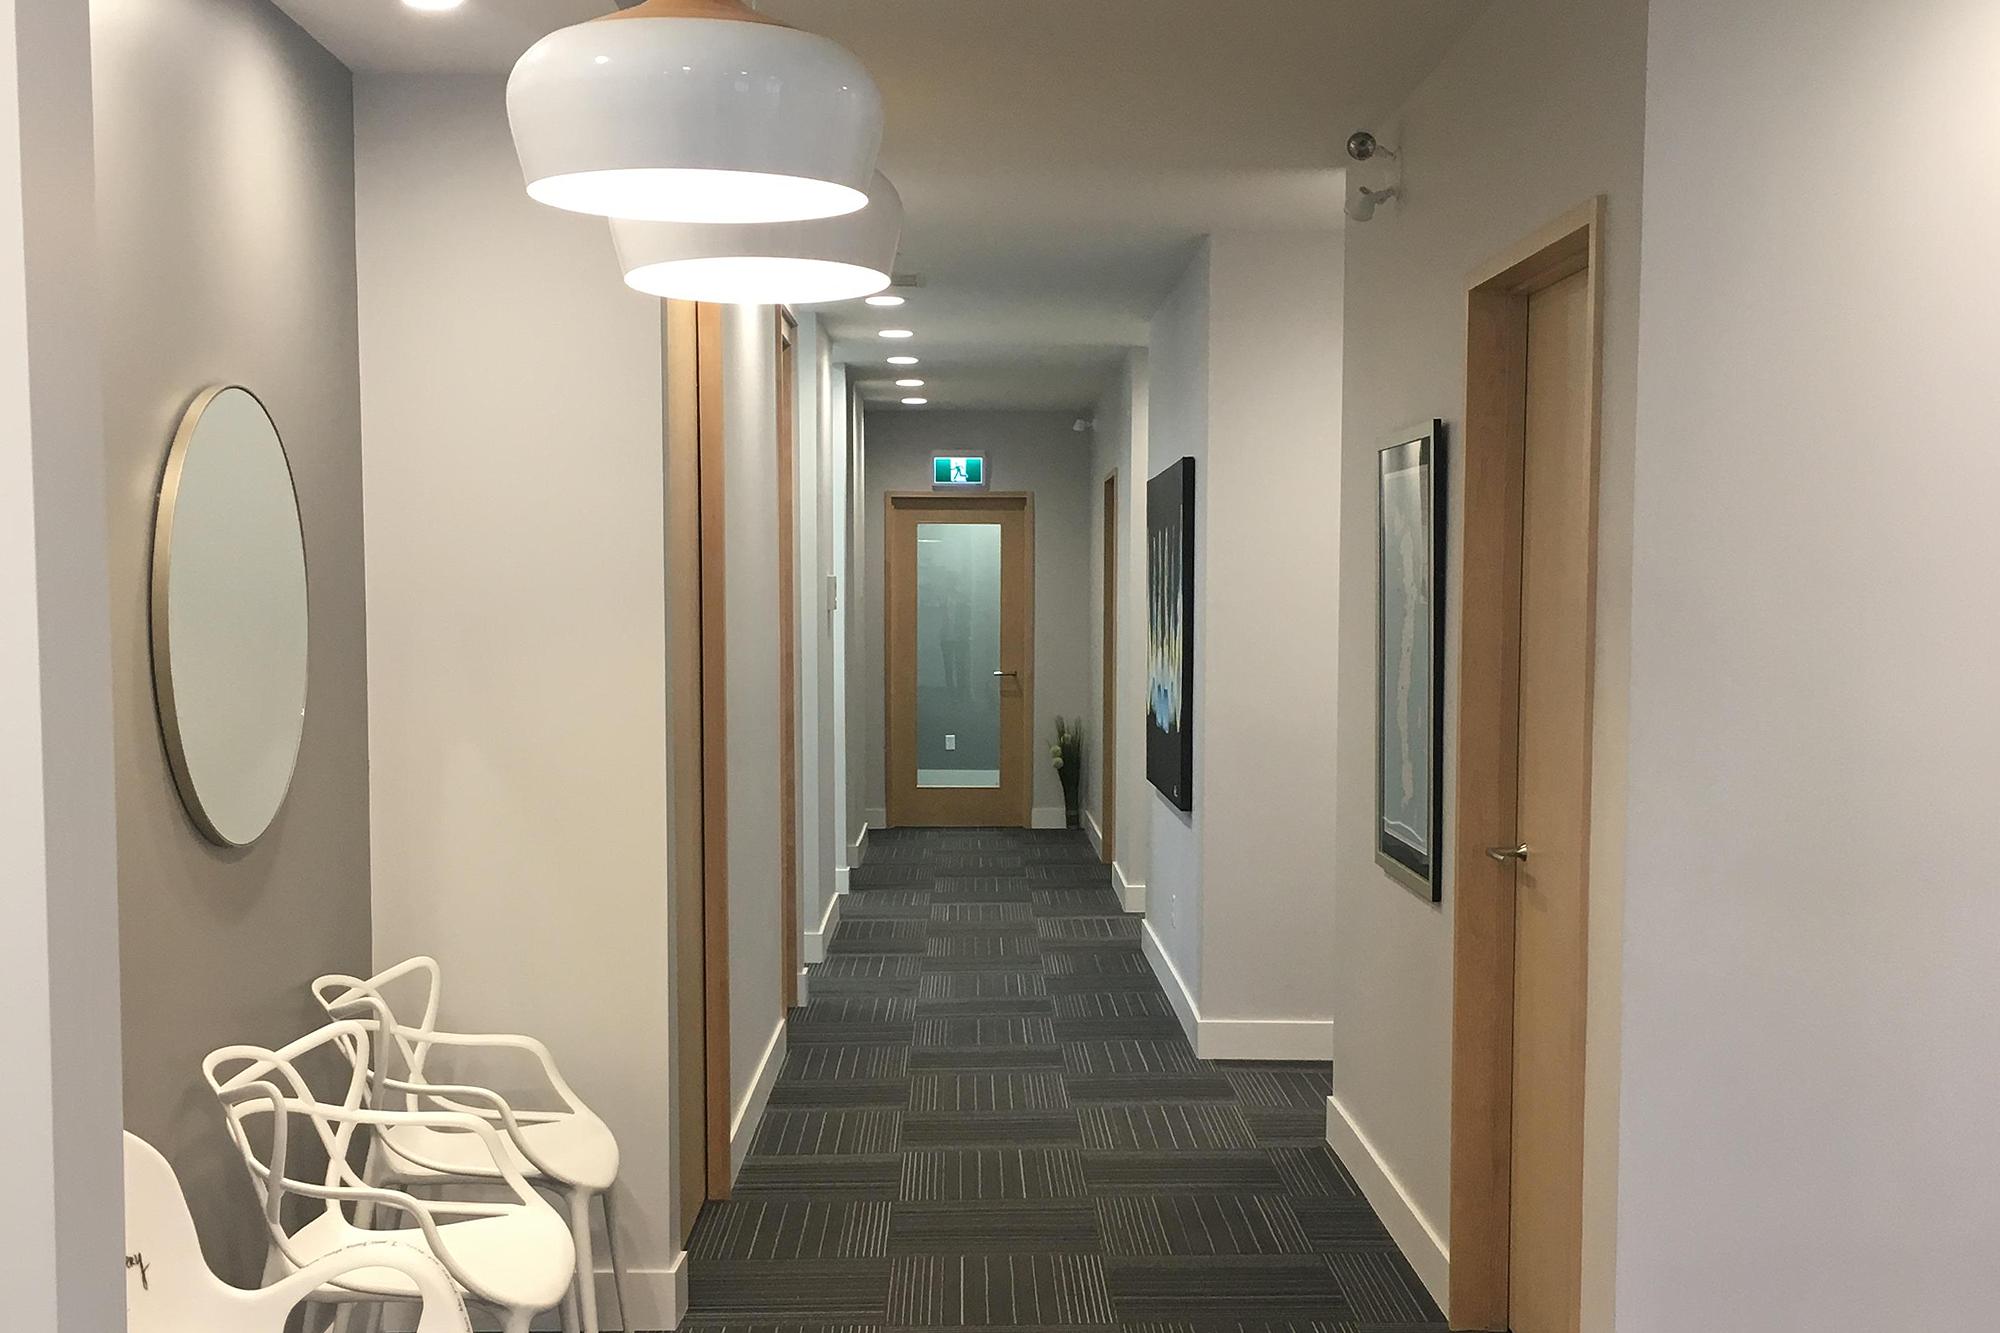 03-Corridor2.jpg